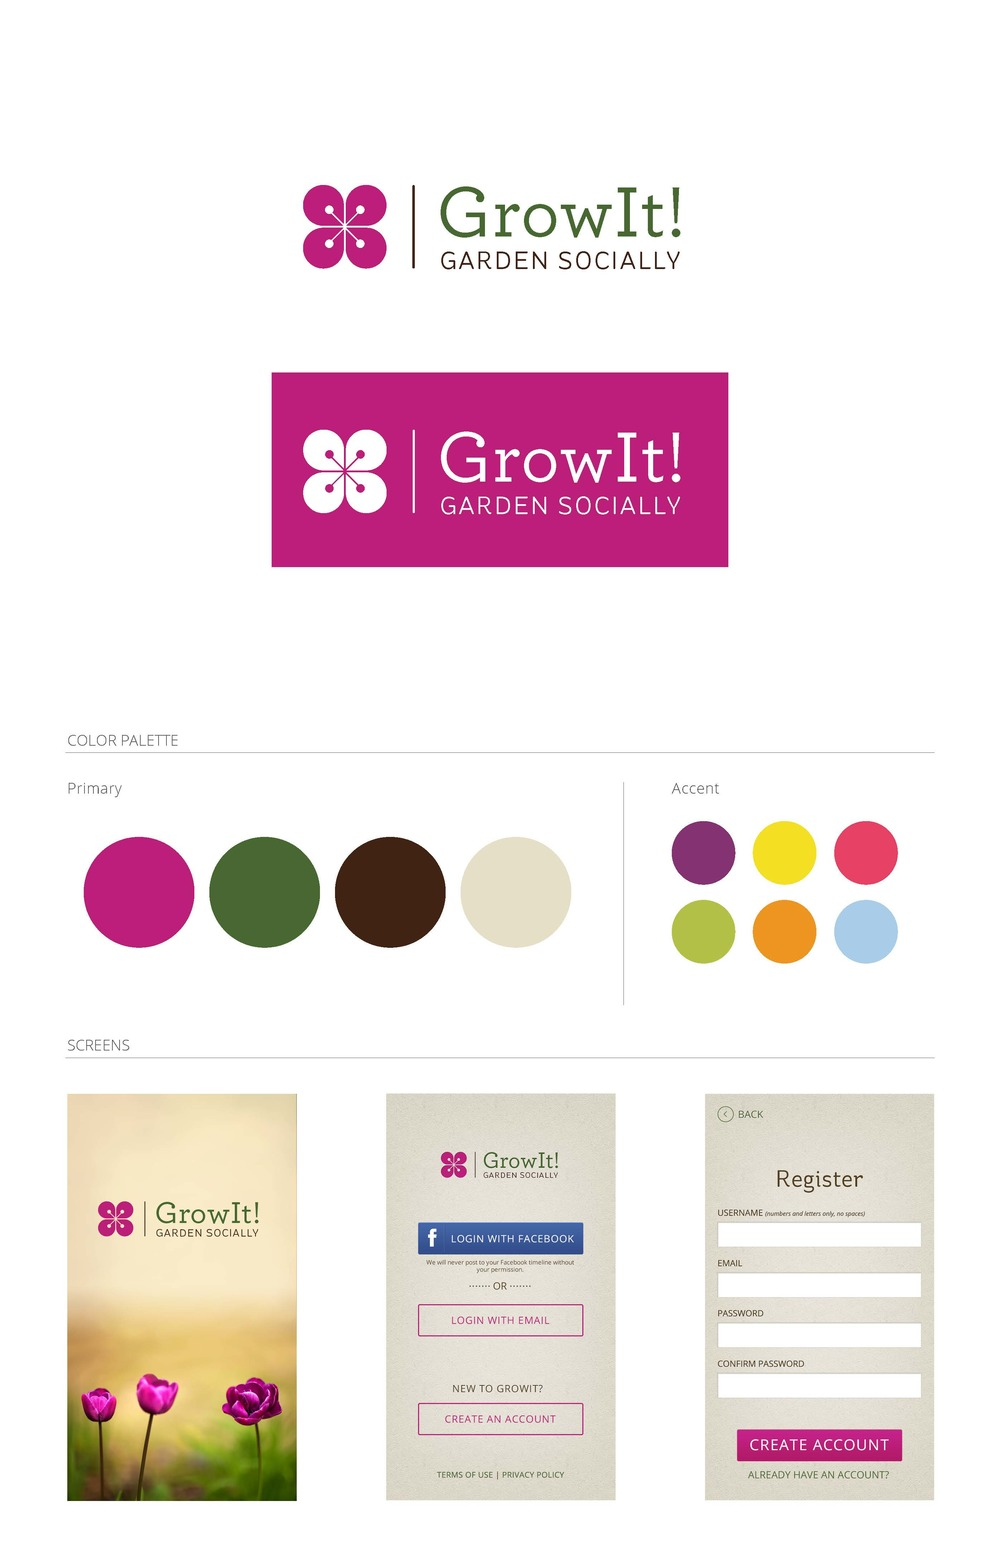 03_GrowIt_BrandBoard_KK_050614_Page_2.jpg